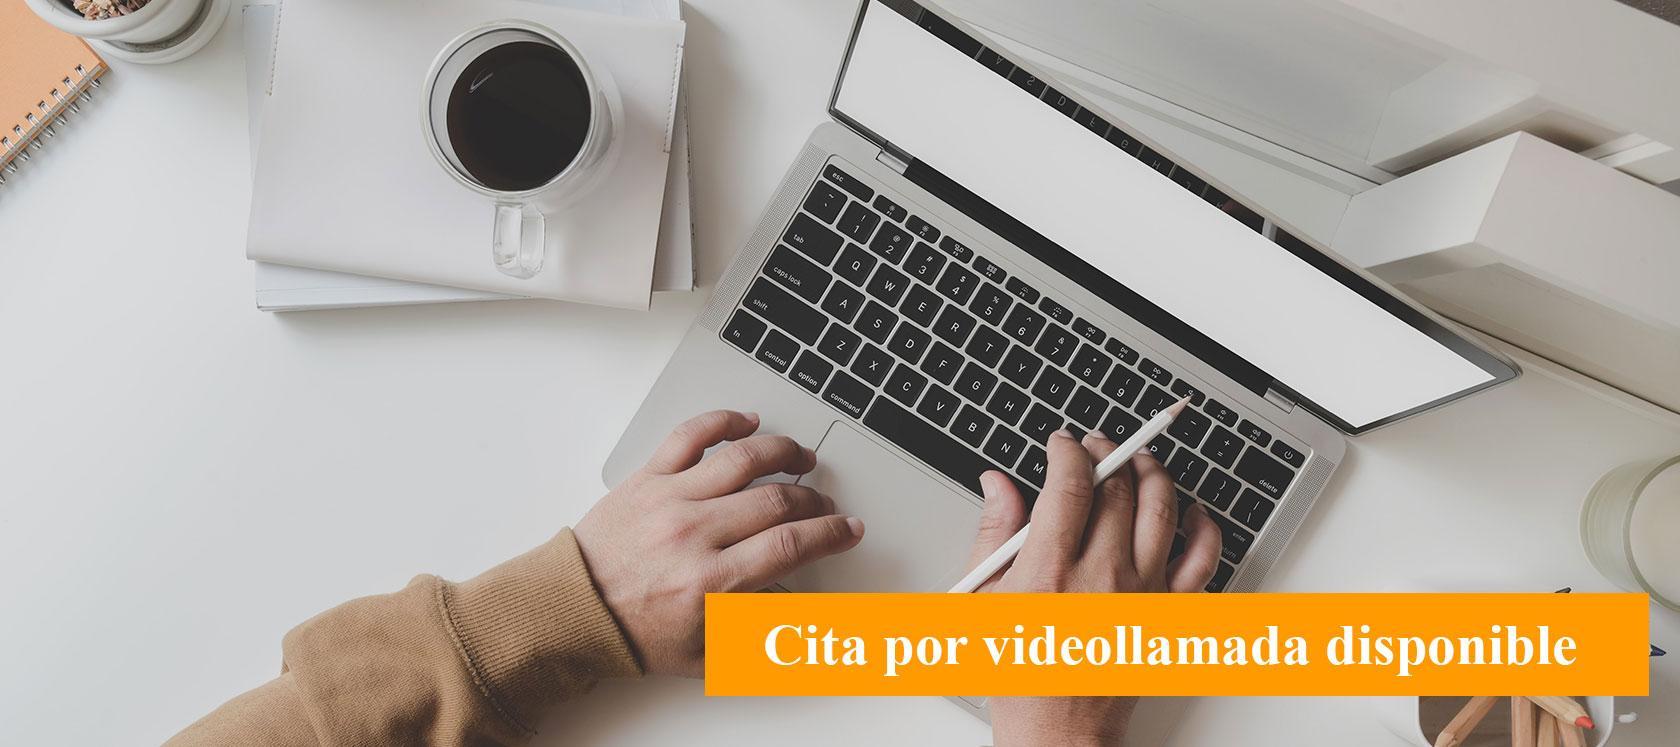 Pisos obra nueva Valencia celere llum patraix